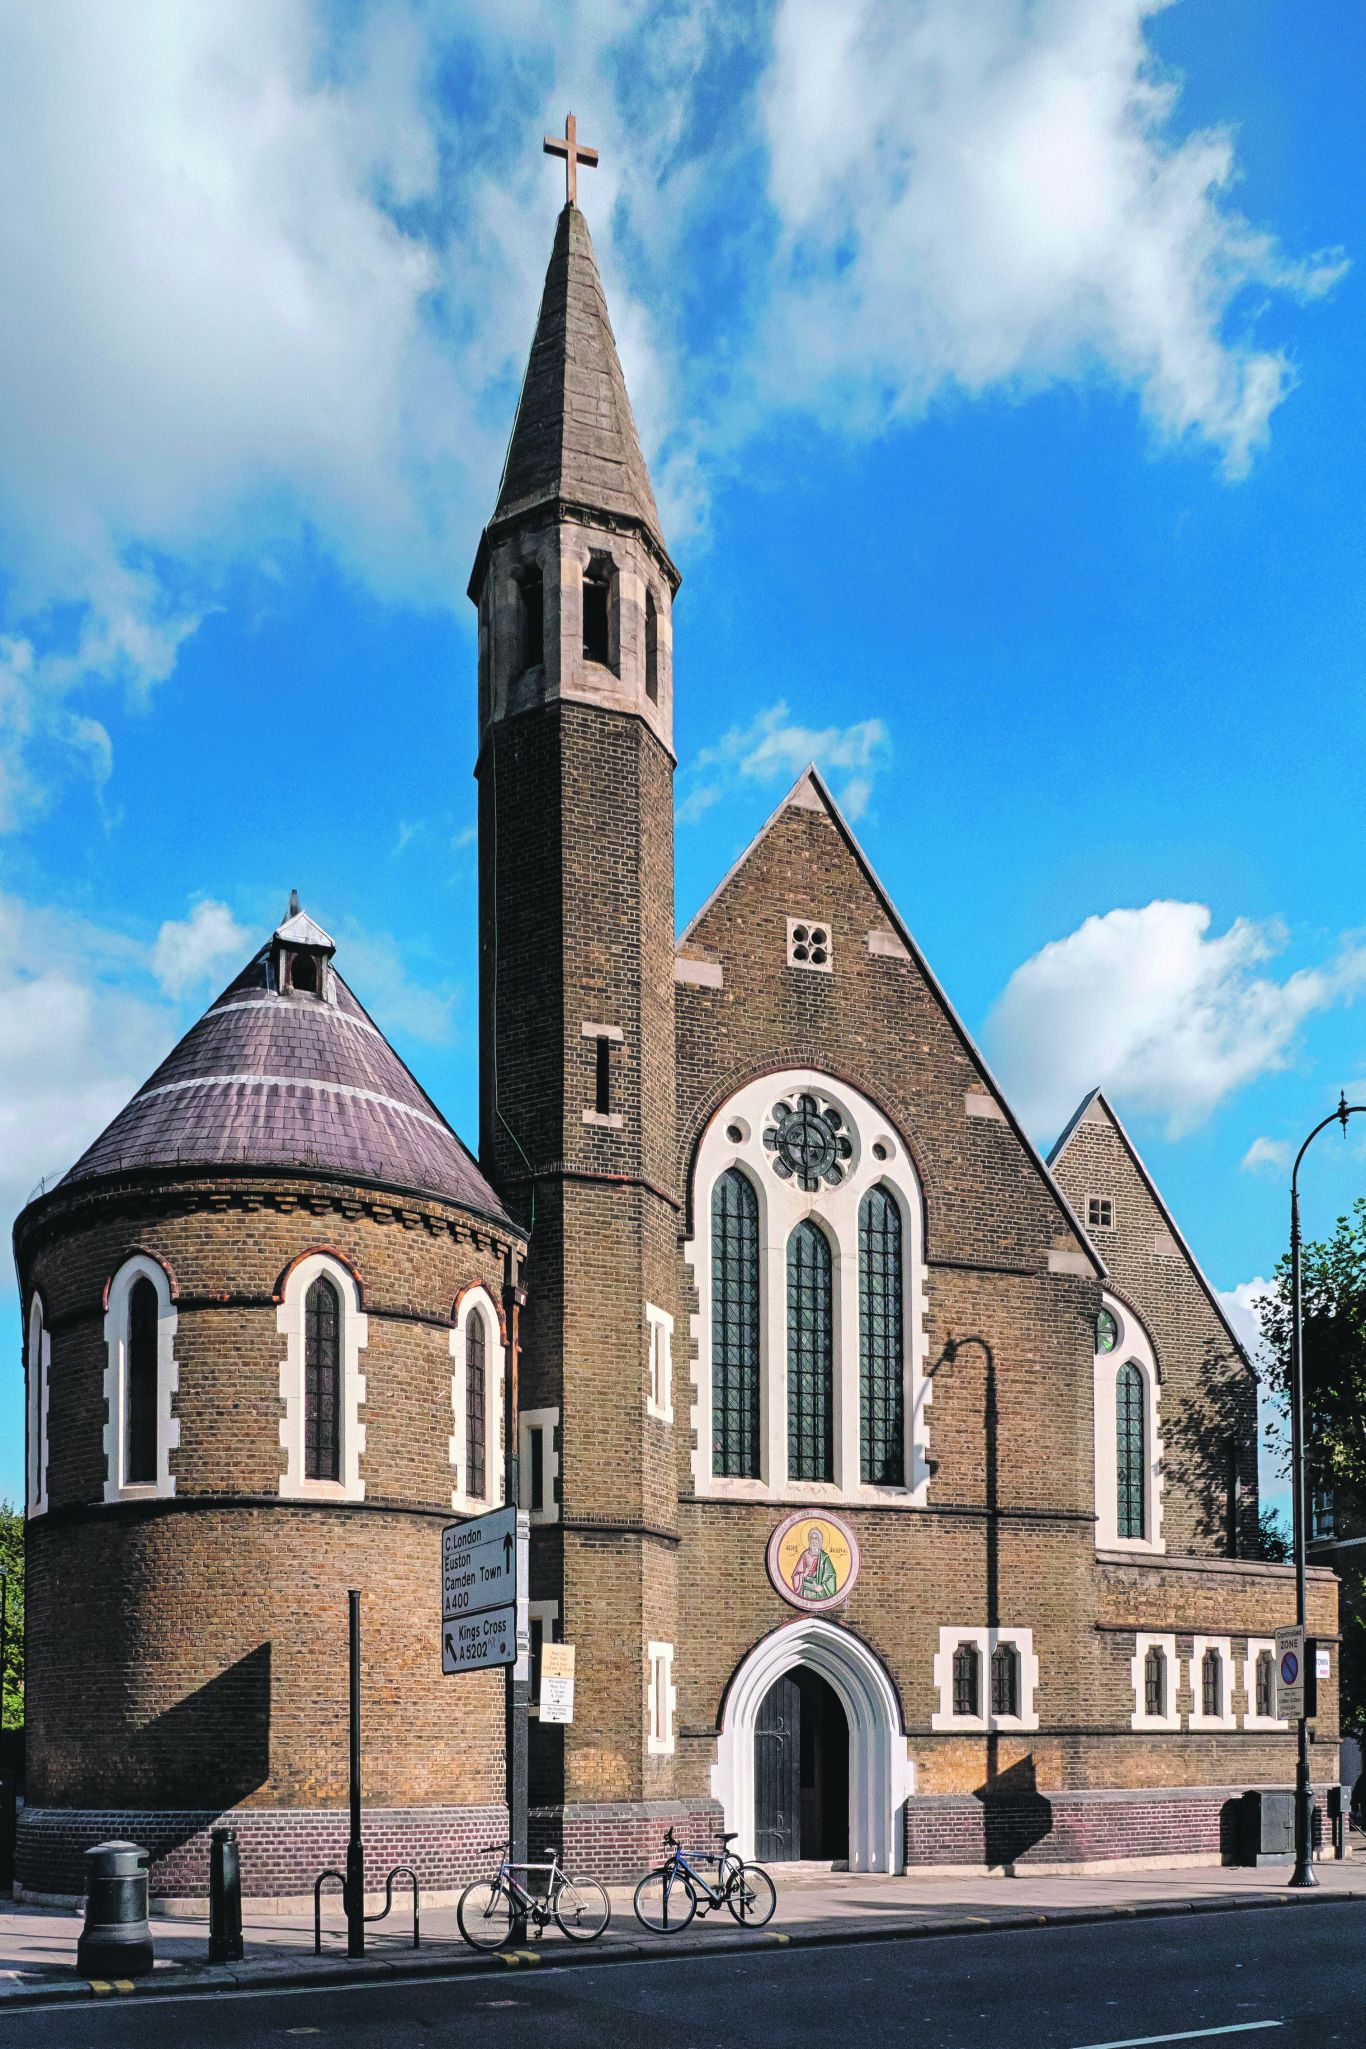 St Andrews. Photo: LB